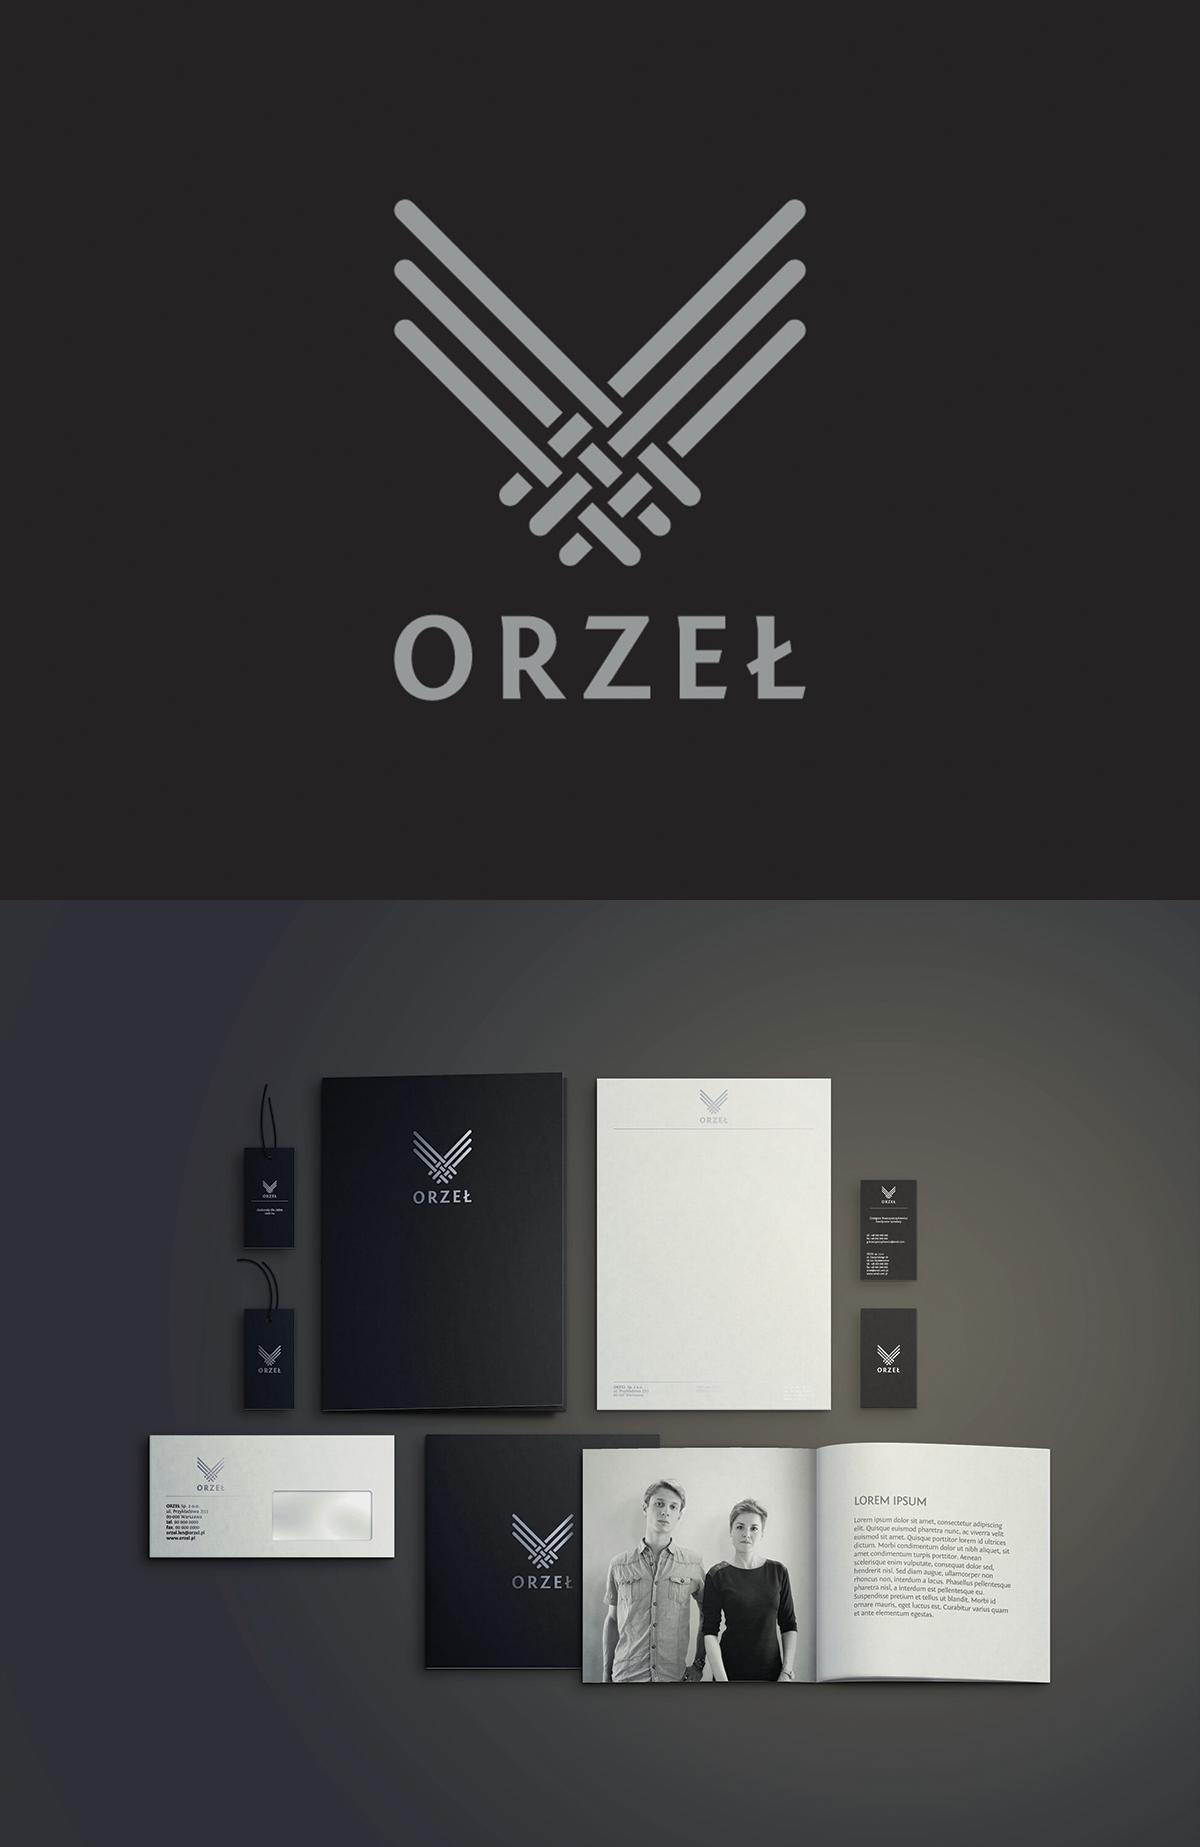 Visual identity for linen fabrics producer Orzeł sp z.o.o